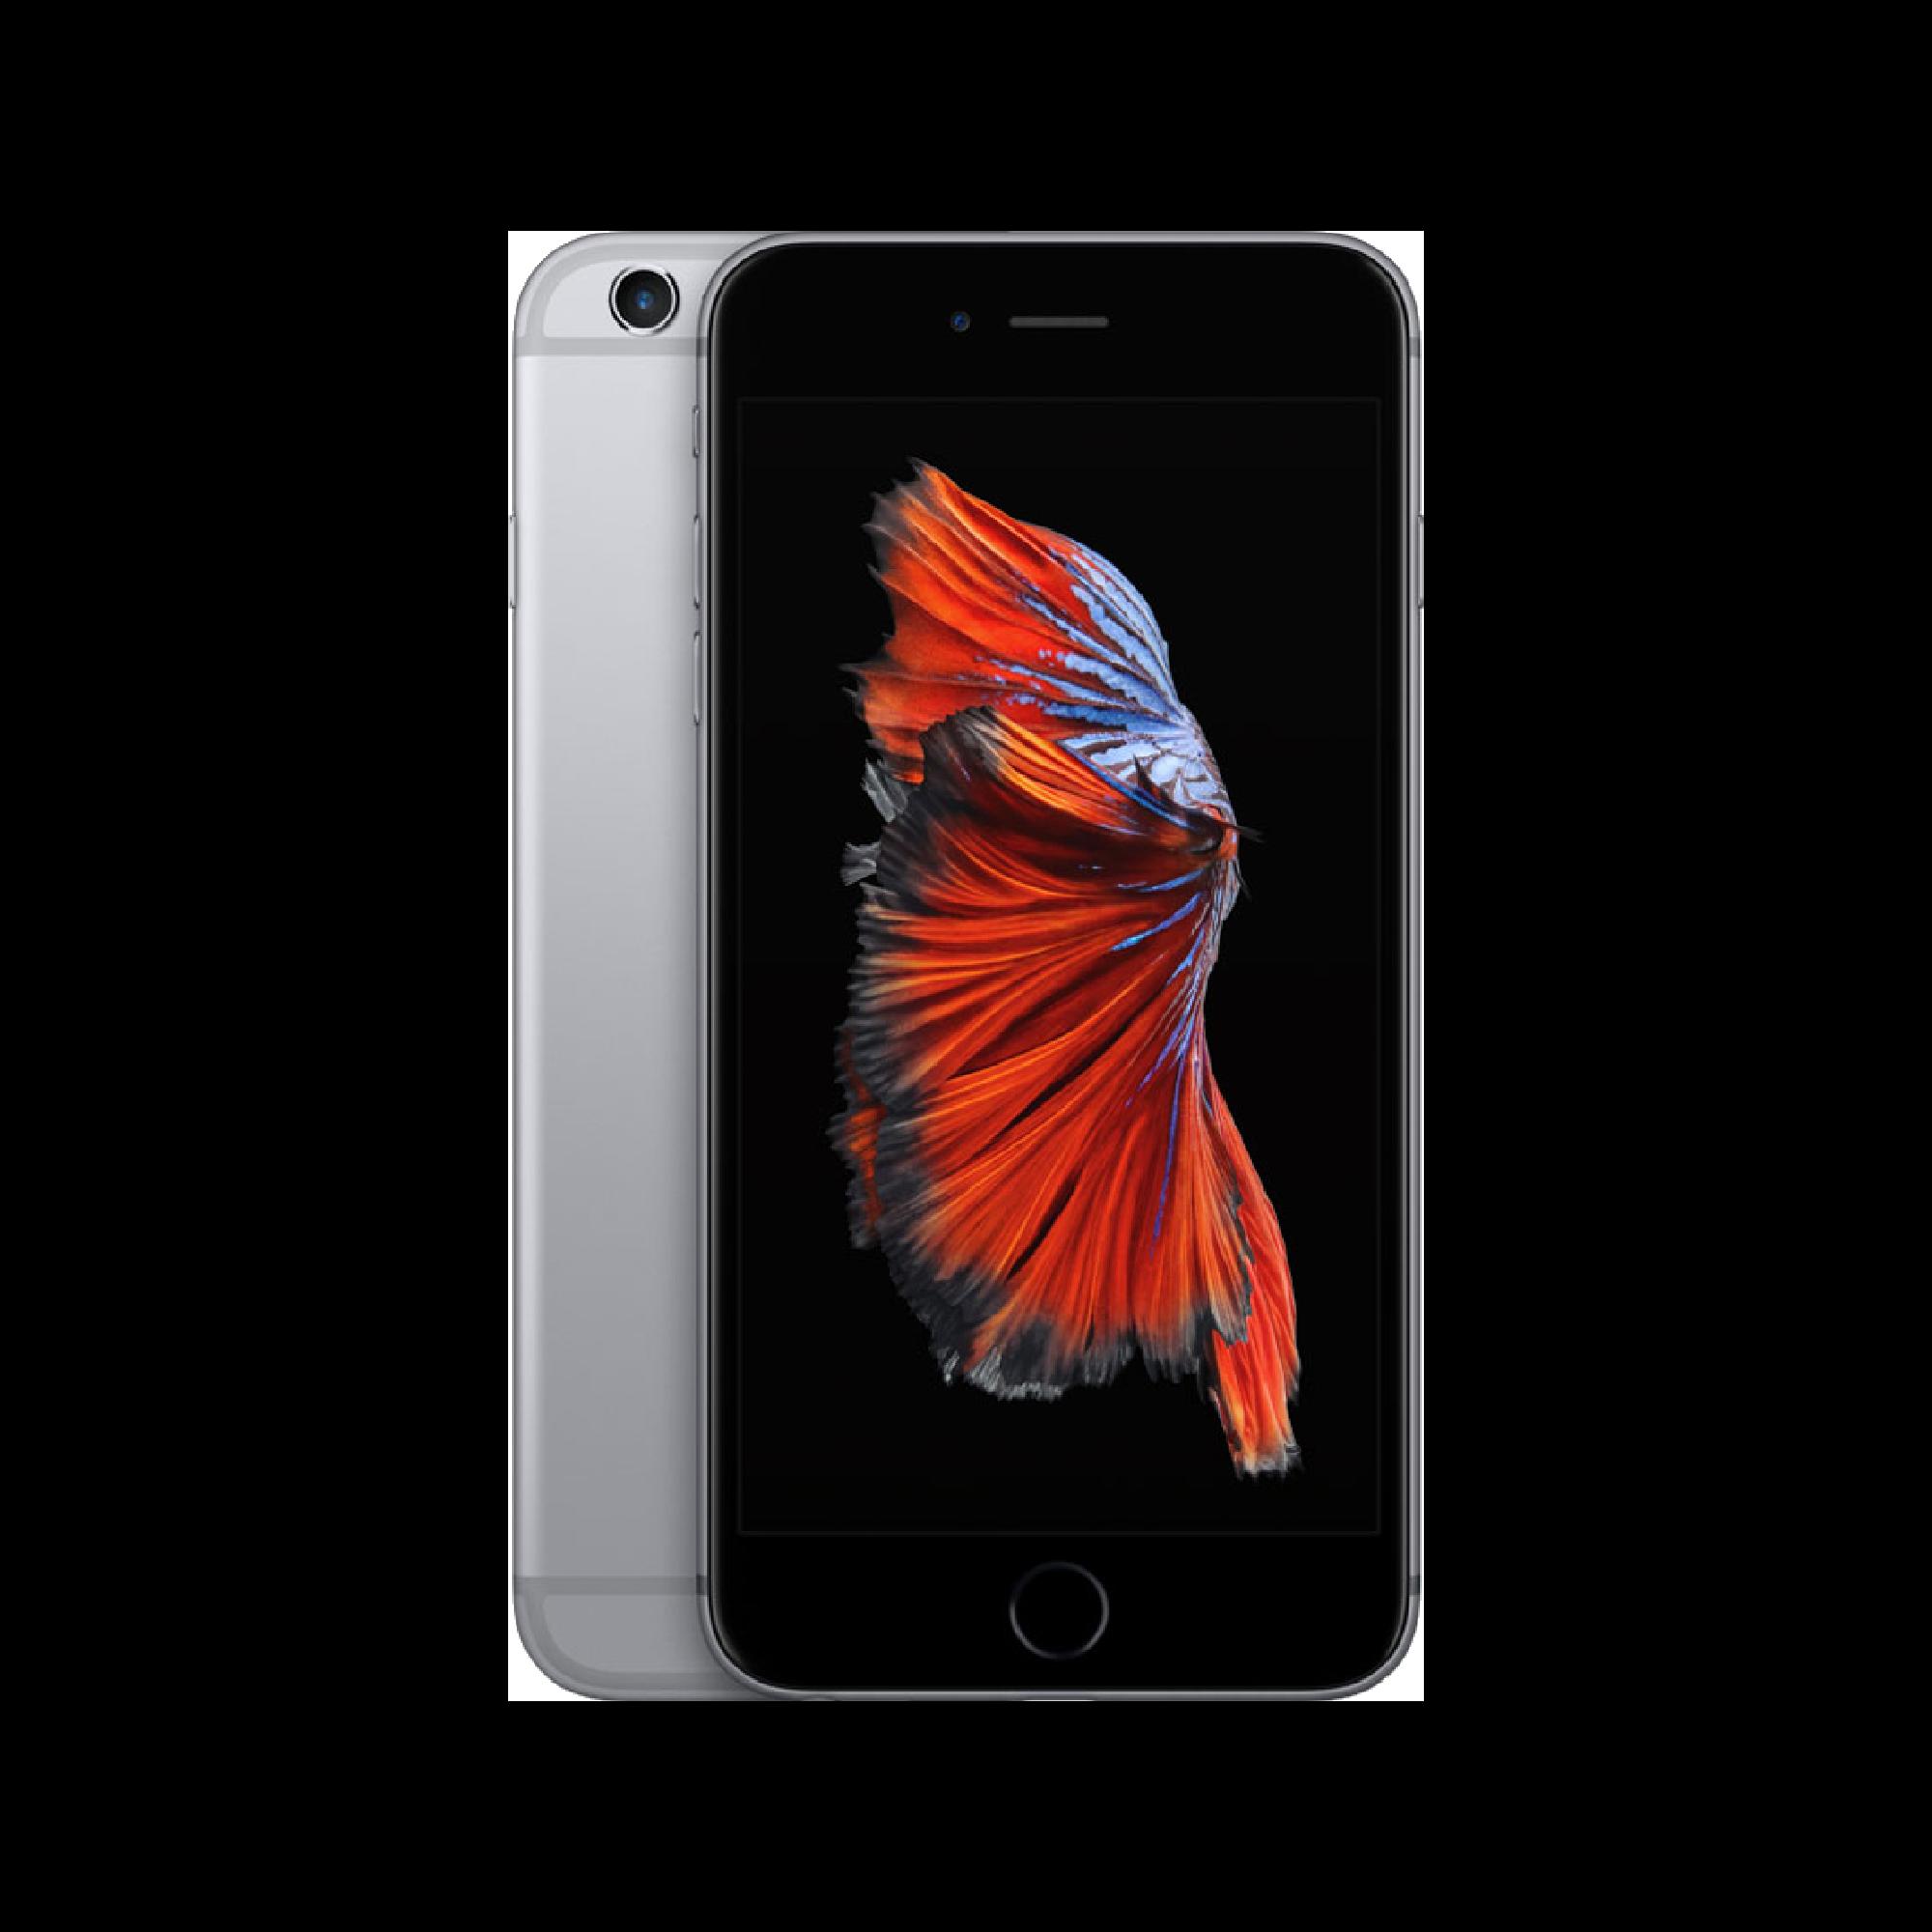 iPhone 6S+ | $105 + tax